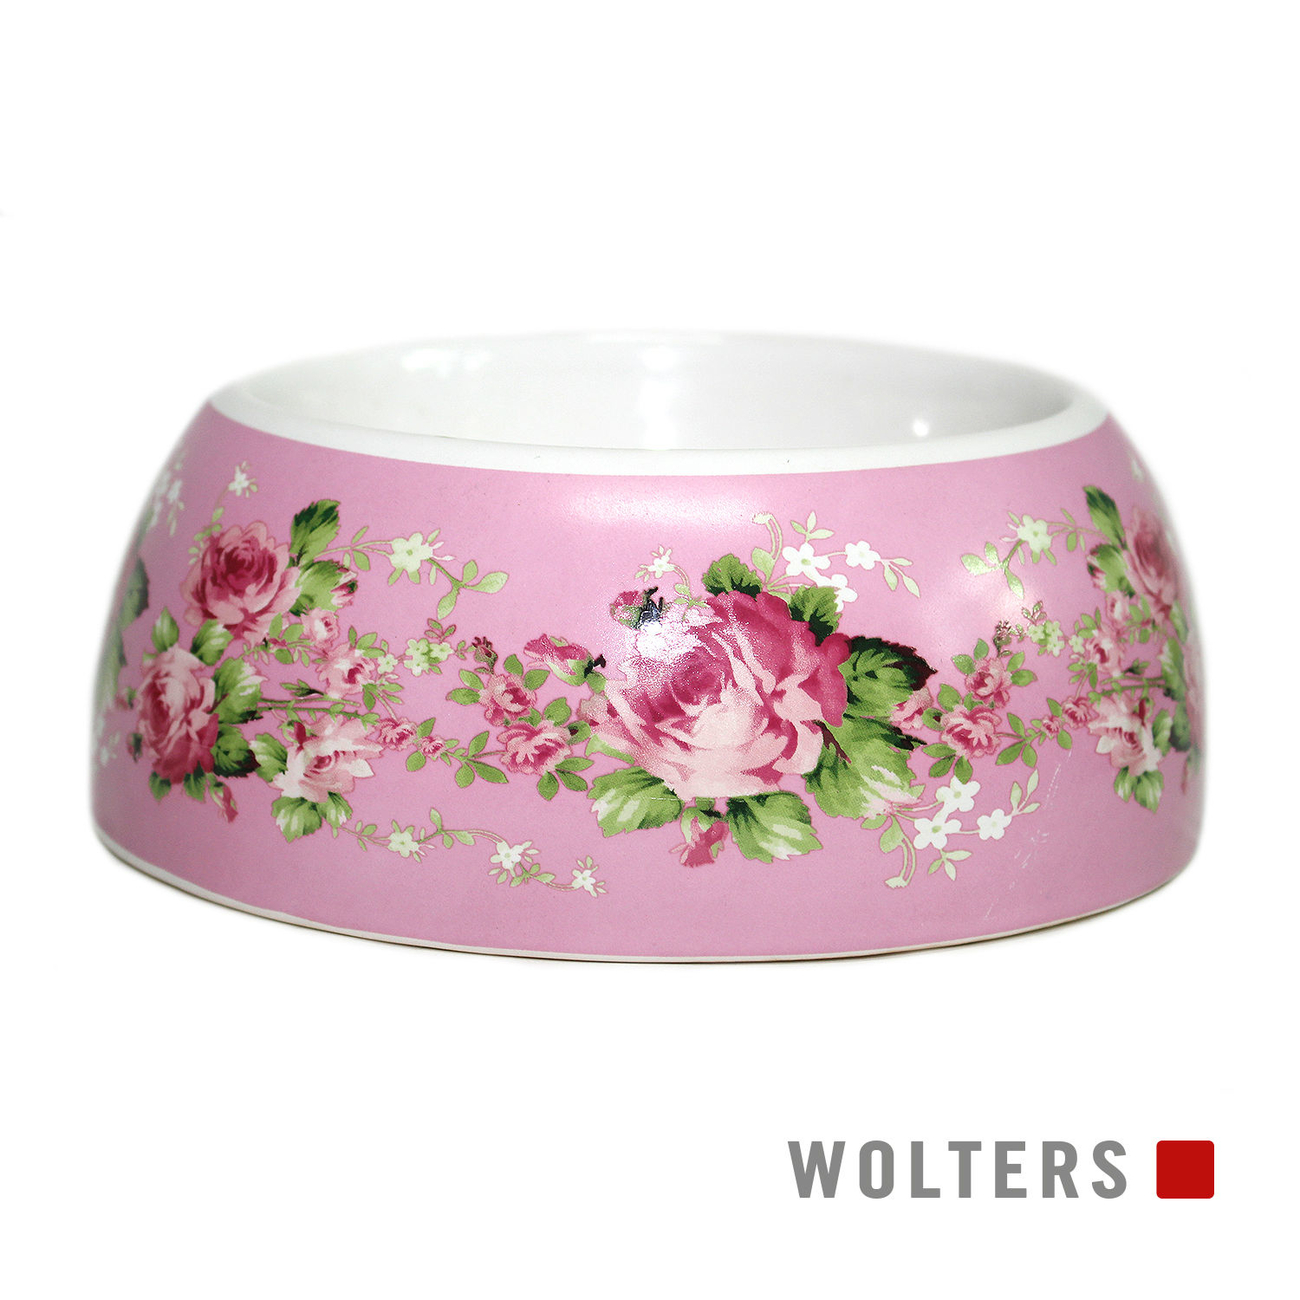 Wolters Rosennapf Luise aus Keramik, Bild 2